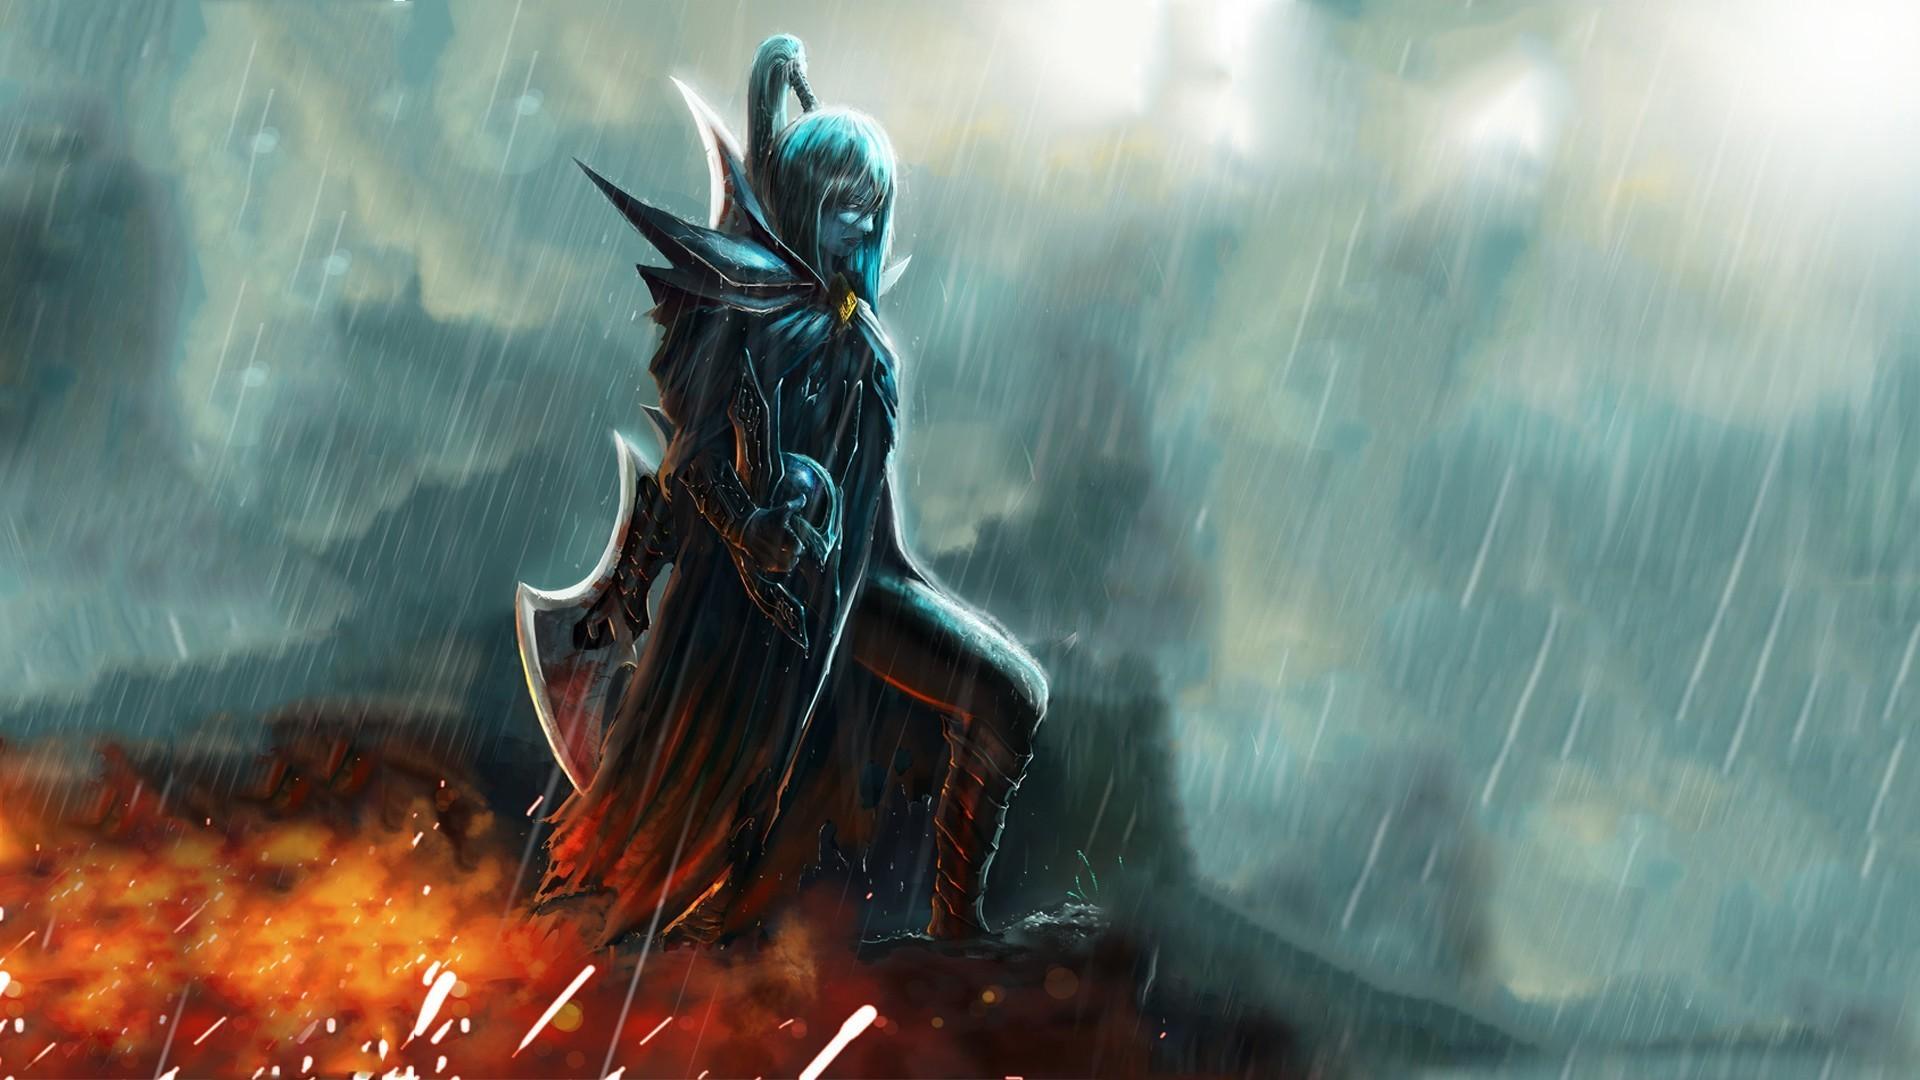 mortred blade heavy rain alone dota 2